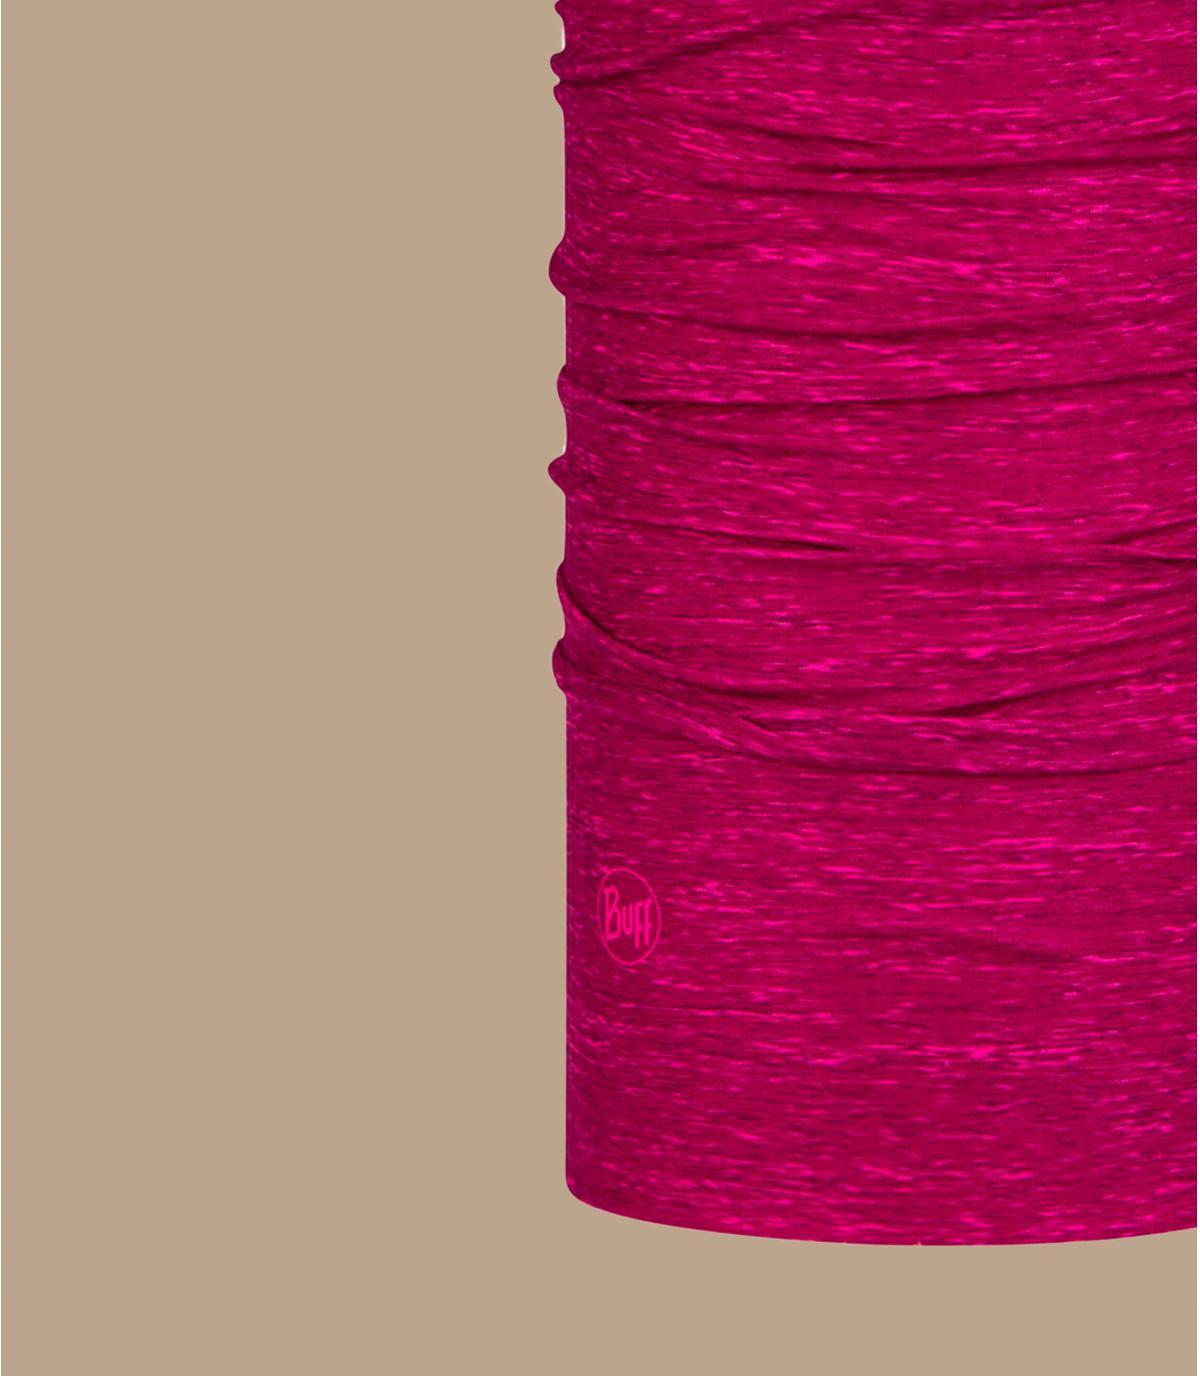 Detalles Filter Tube pump pink imagen 3